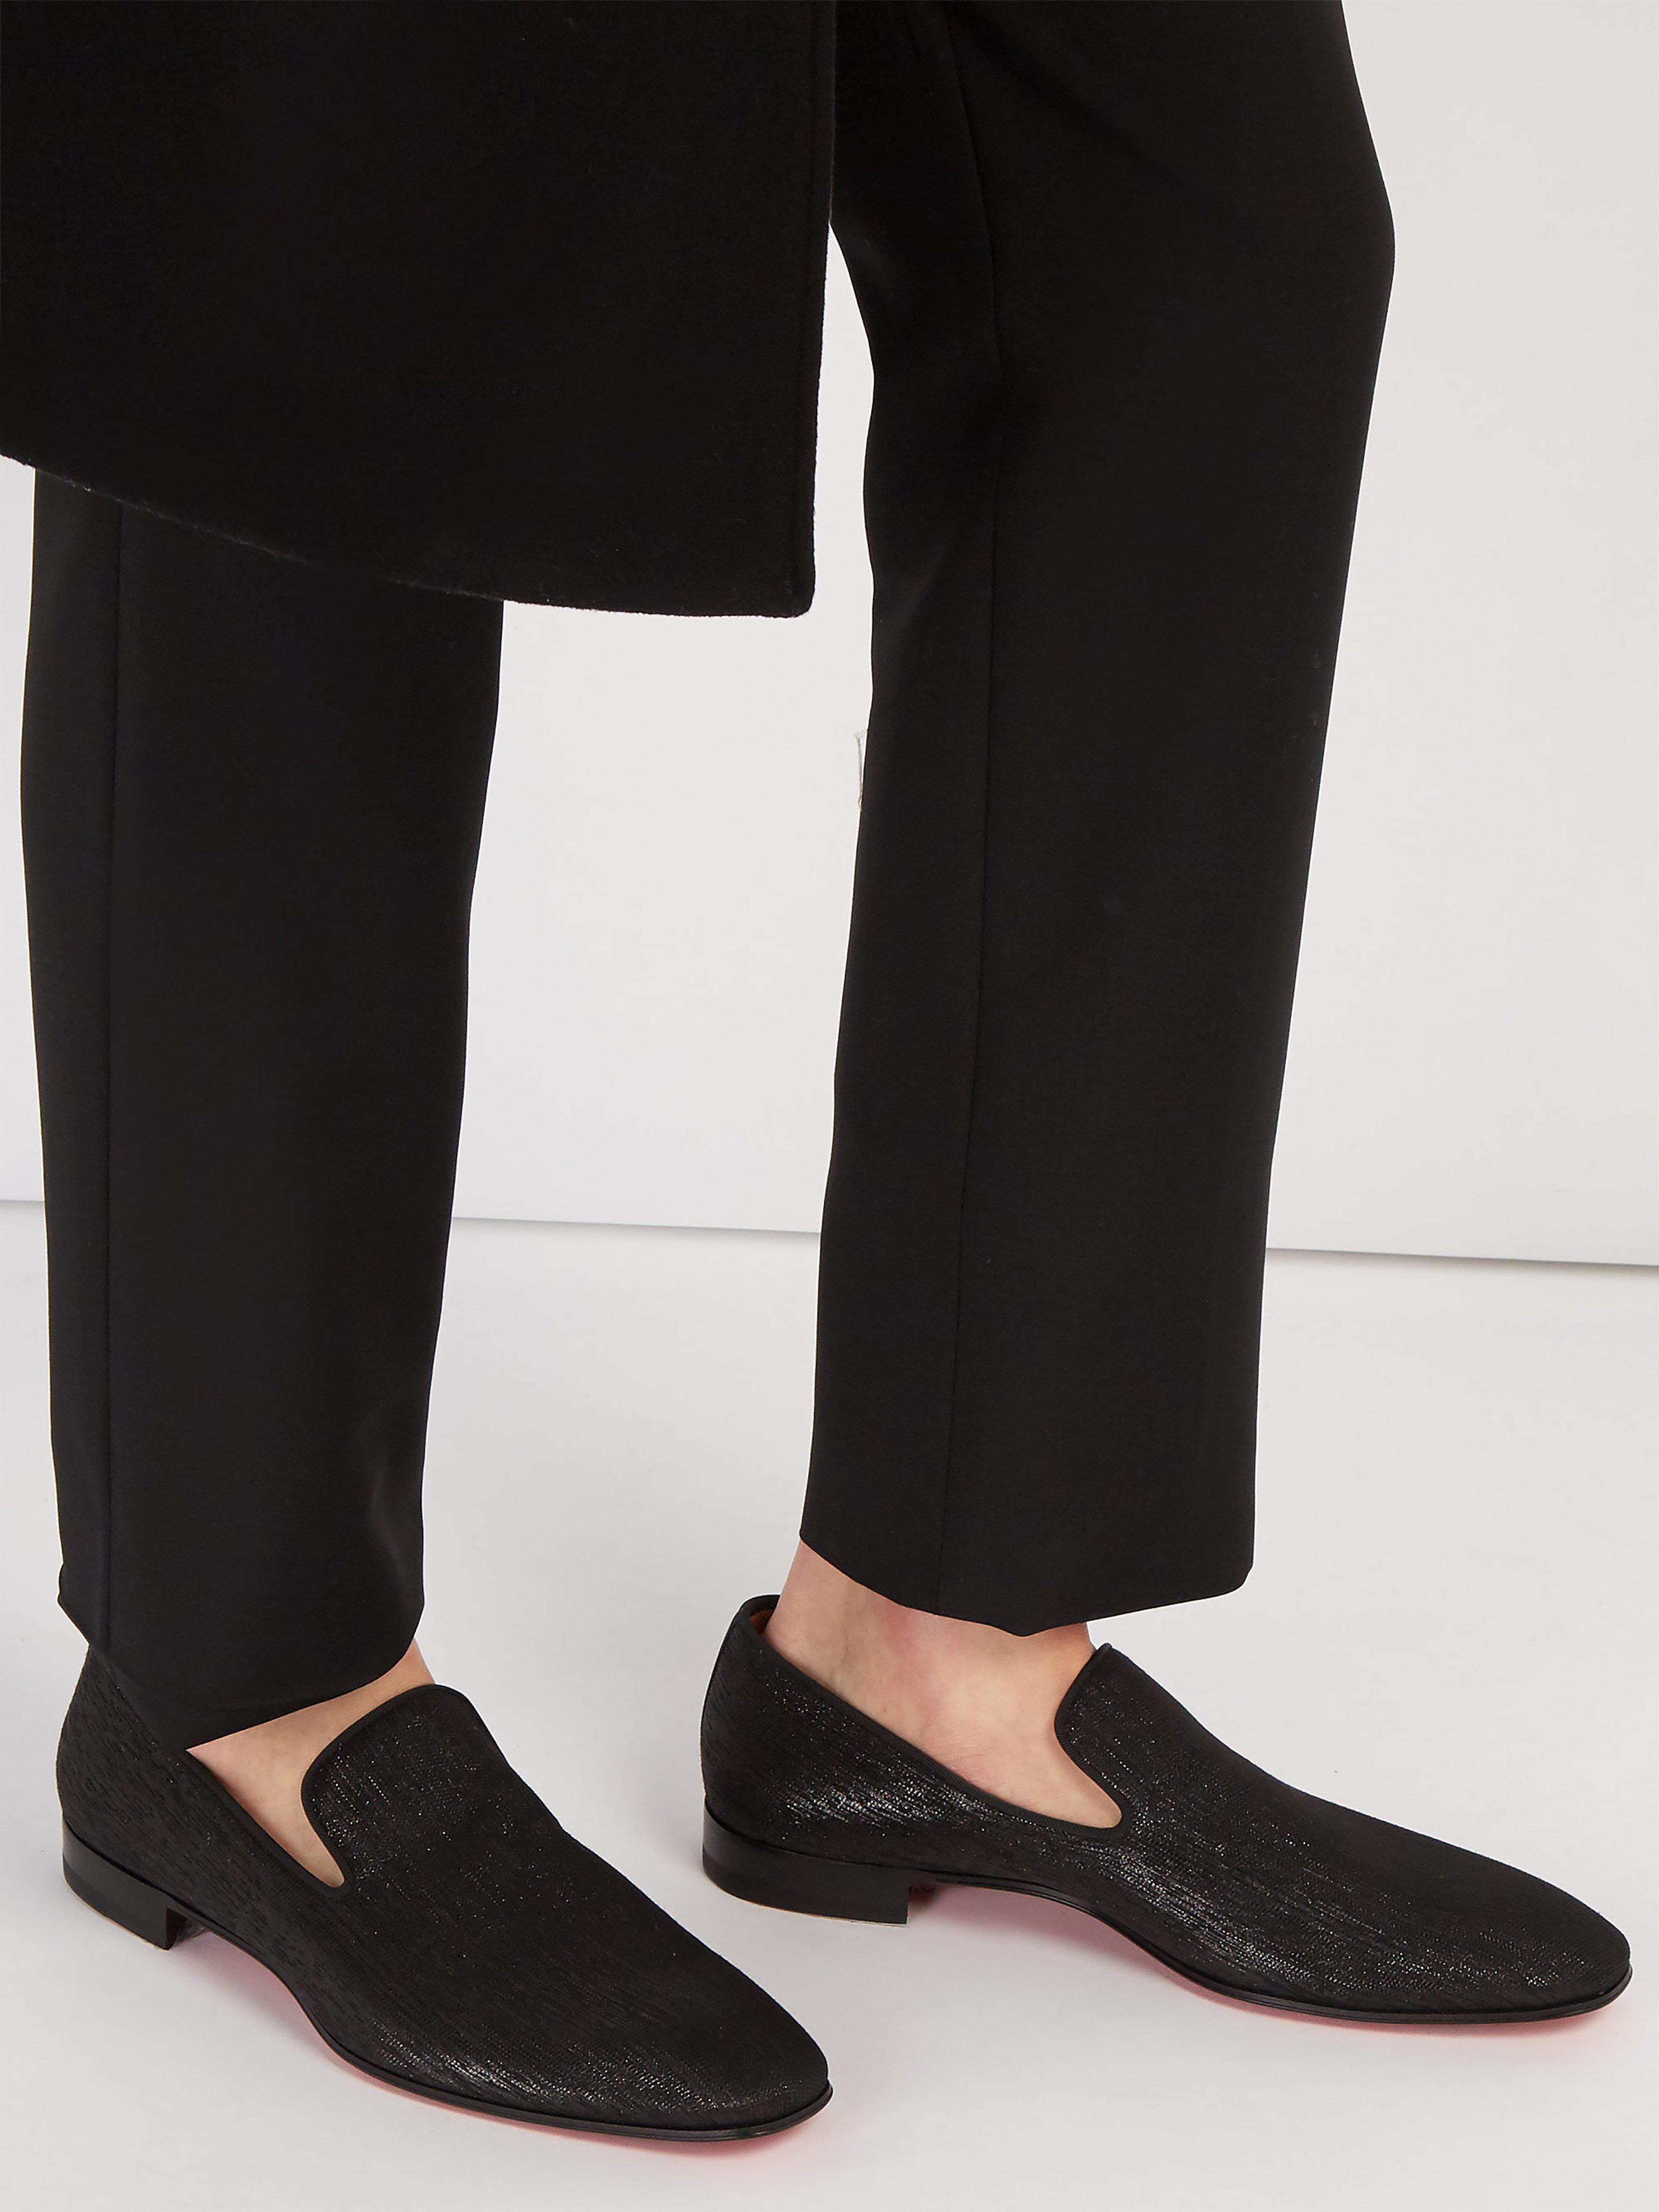 0f645316424e Christian Louboutin Dandelion Metallic Shantung Loafers in Black for Men -  Lyst